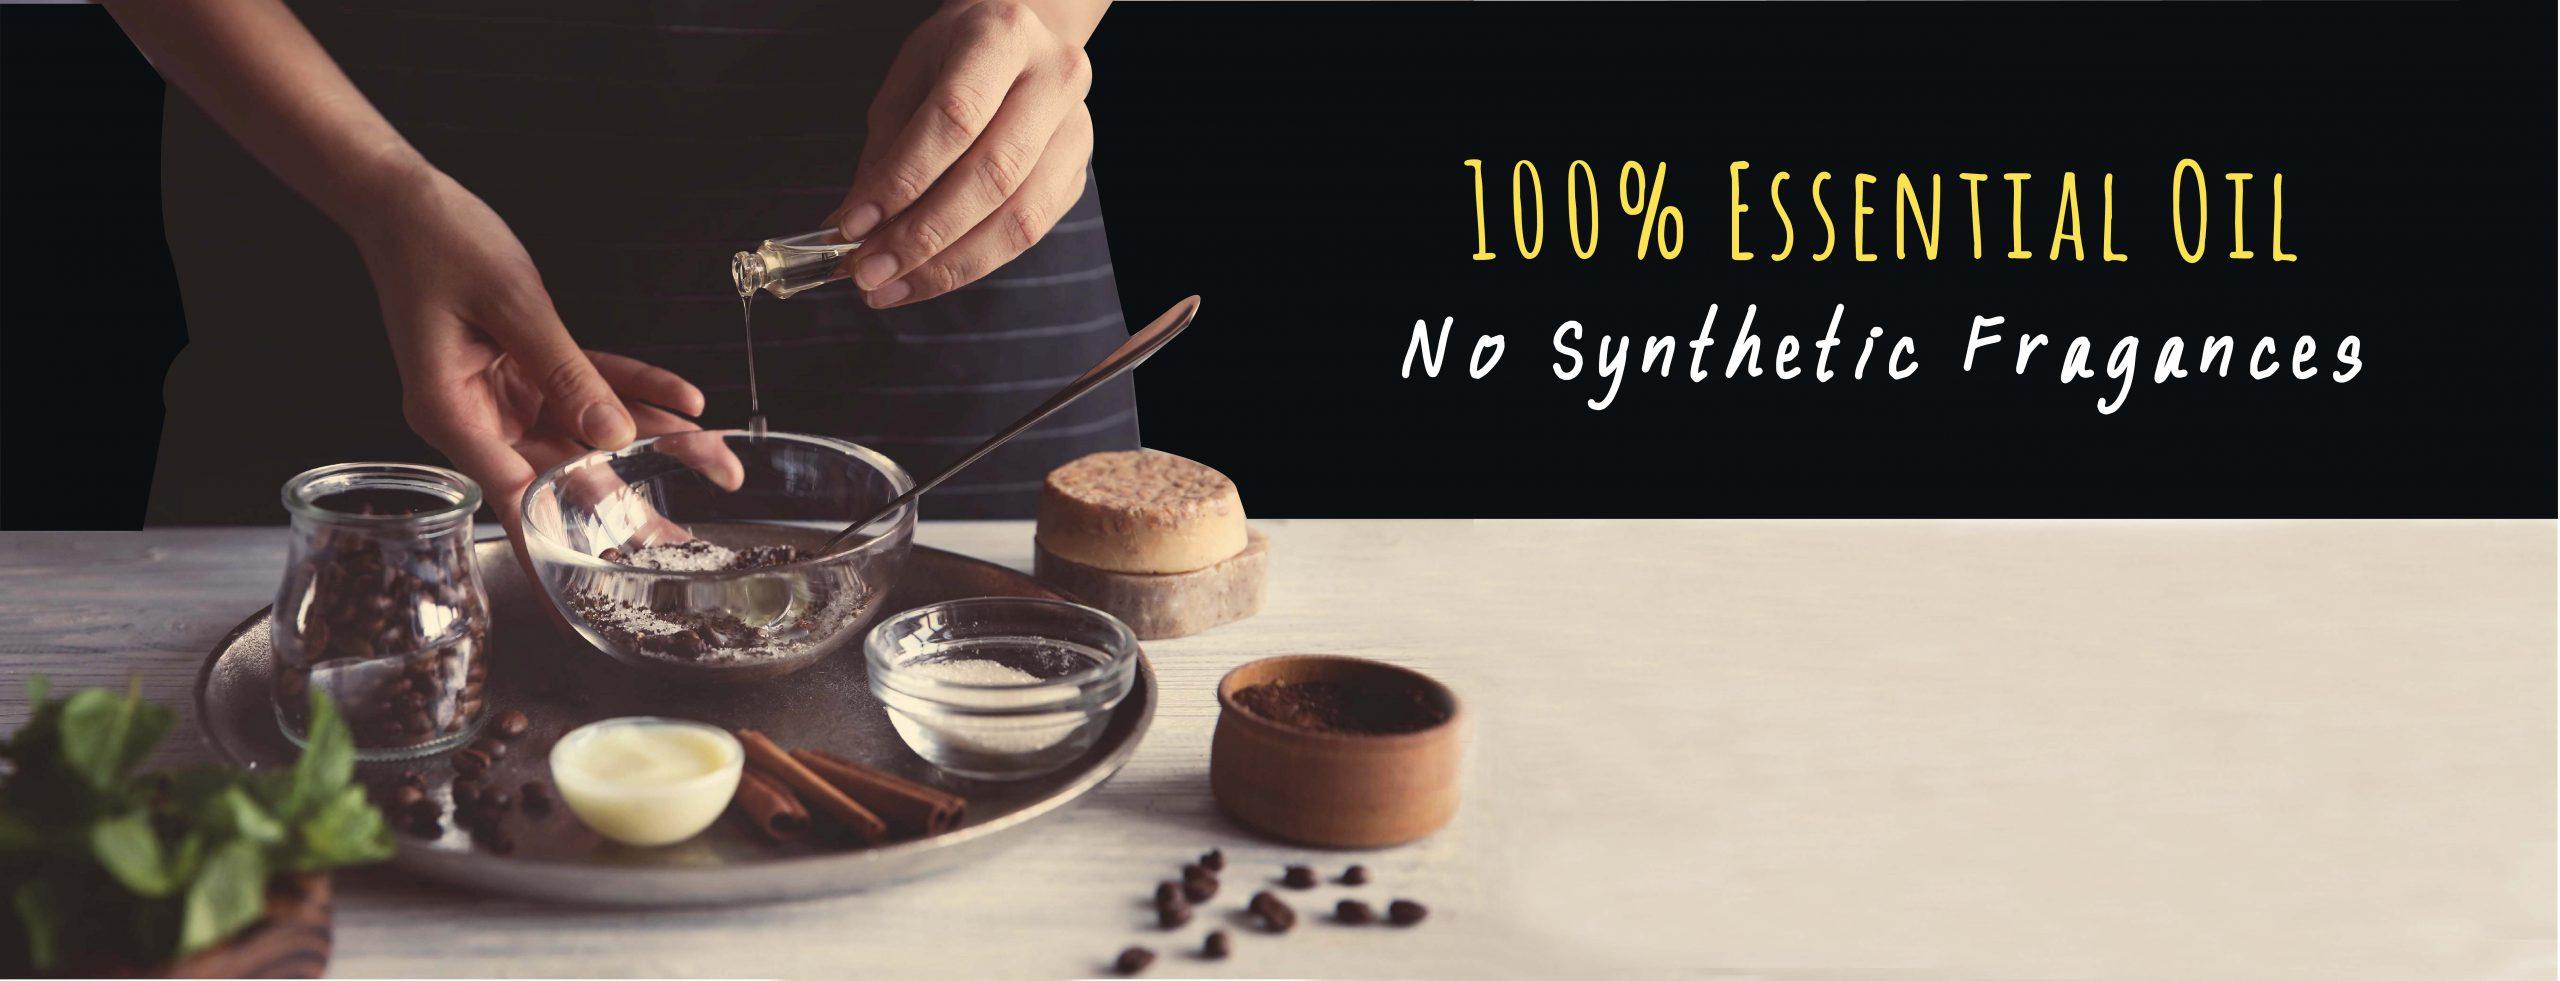 Elyrest by baanidin pop up 100% Essential Oil